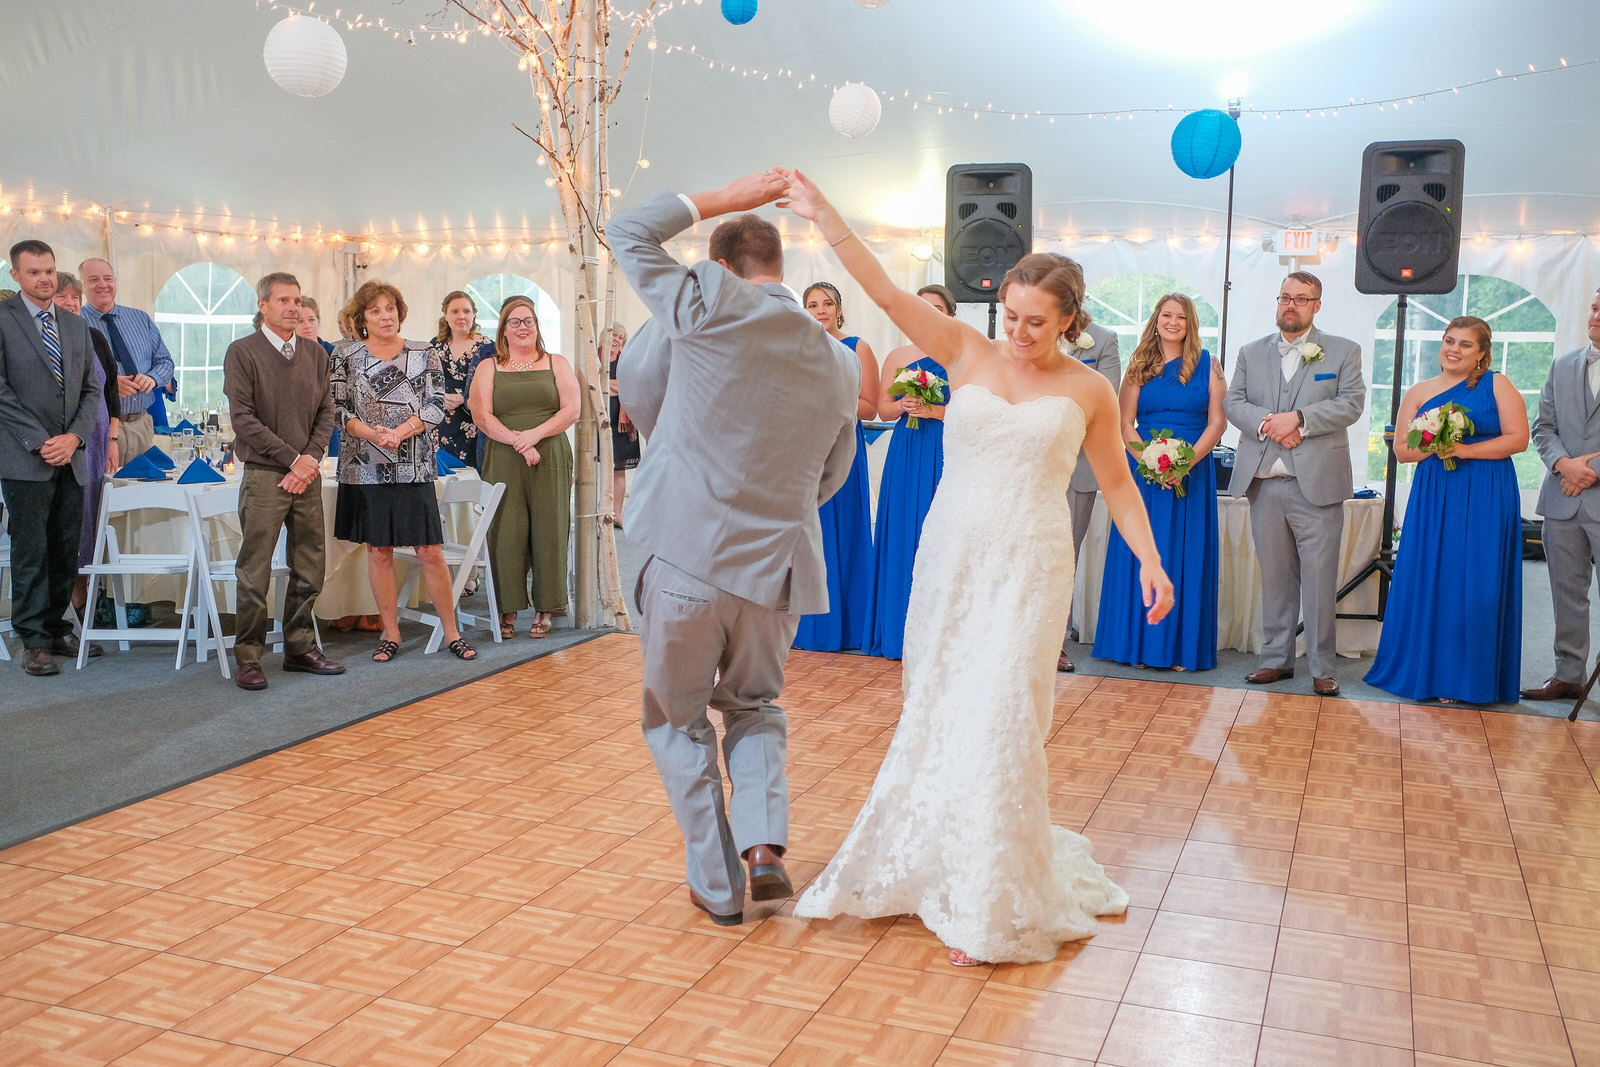 waterville-valley-wedding-photography-1379.jpg